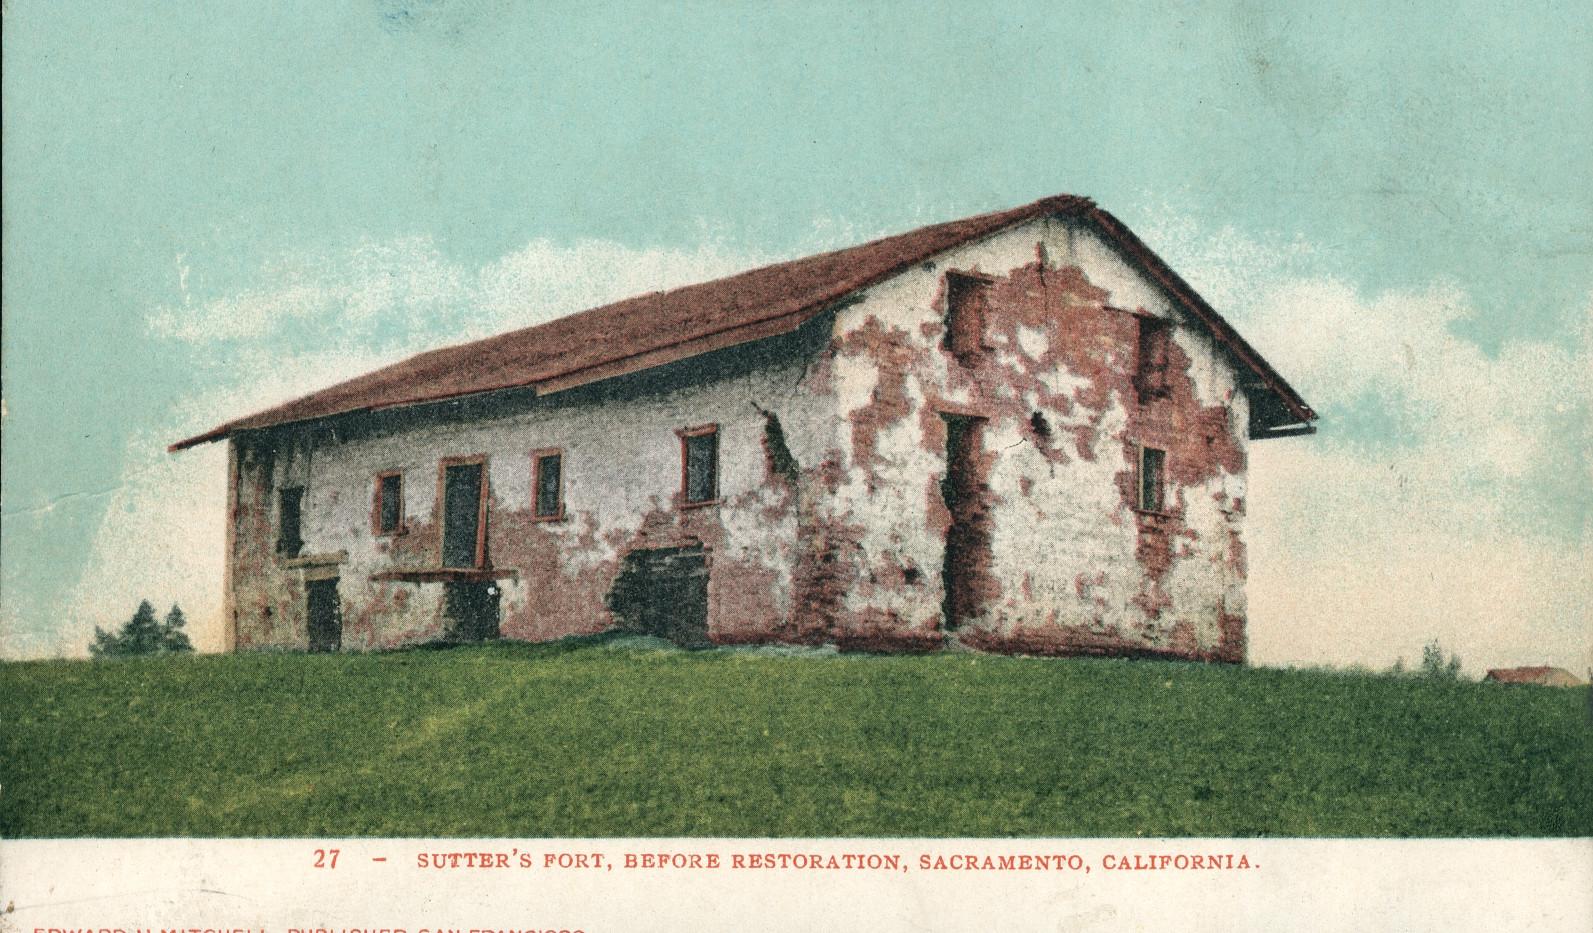 Sutter's Fort, Before Restoration, Sacramento, California